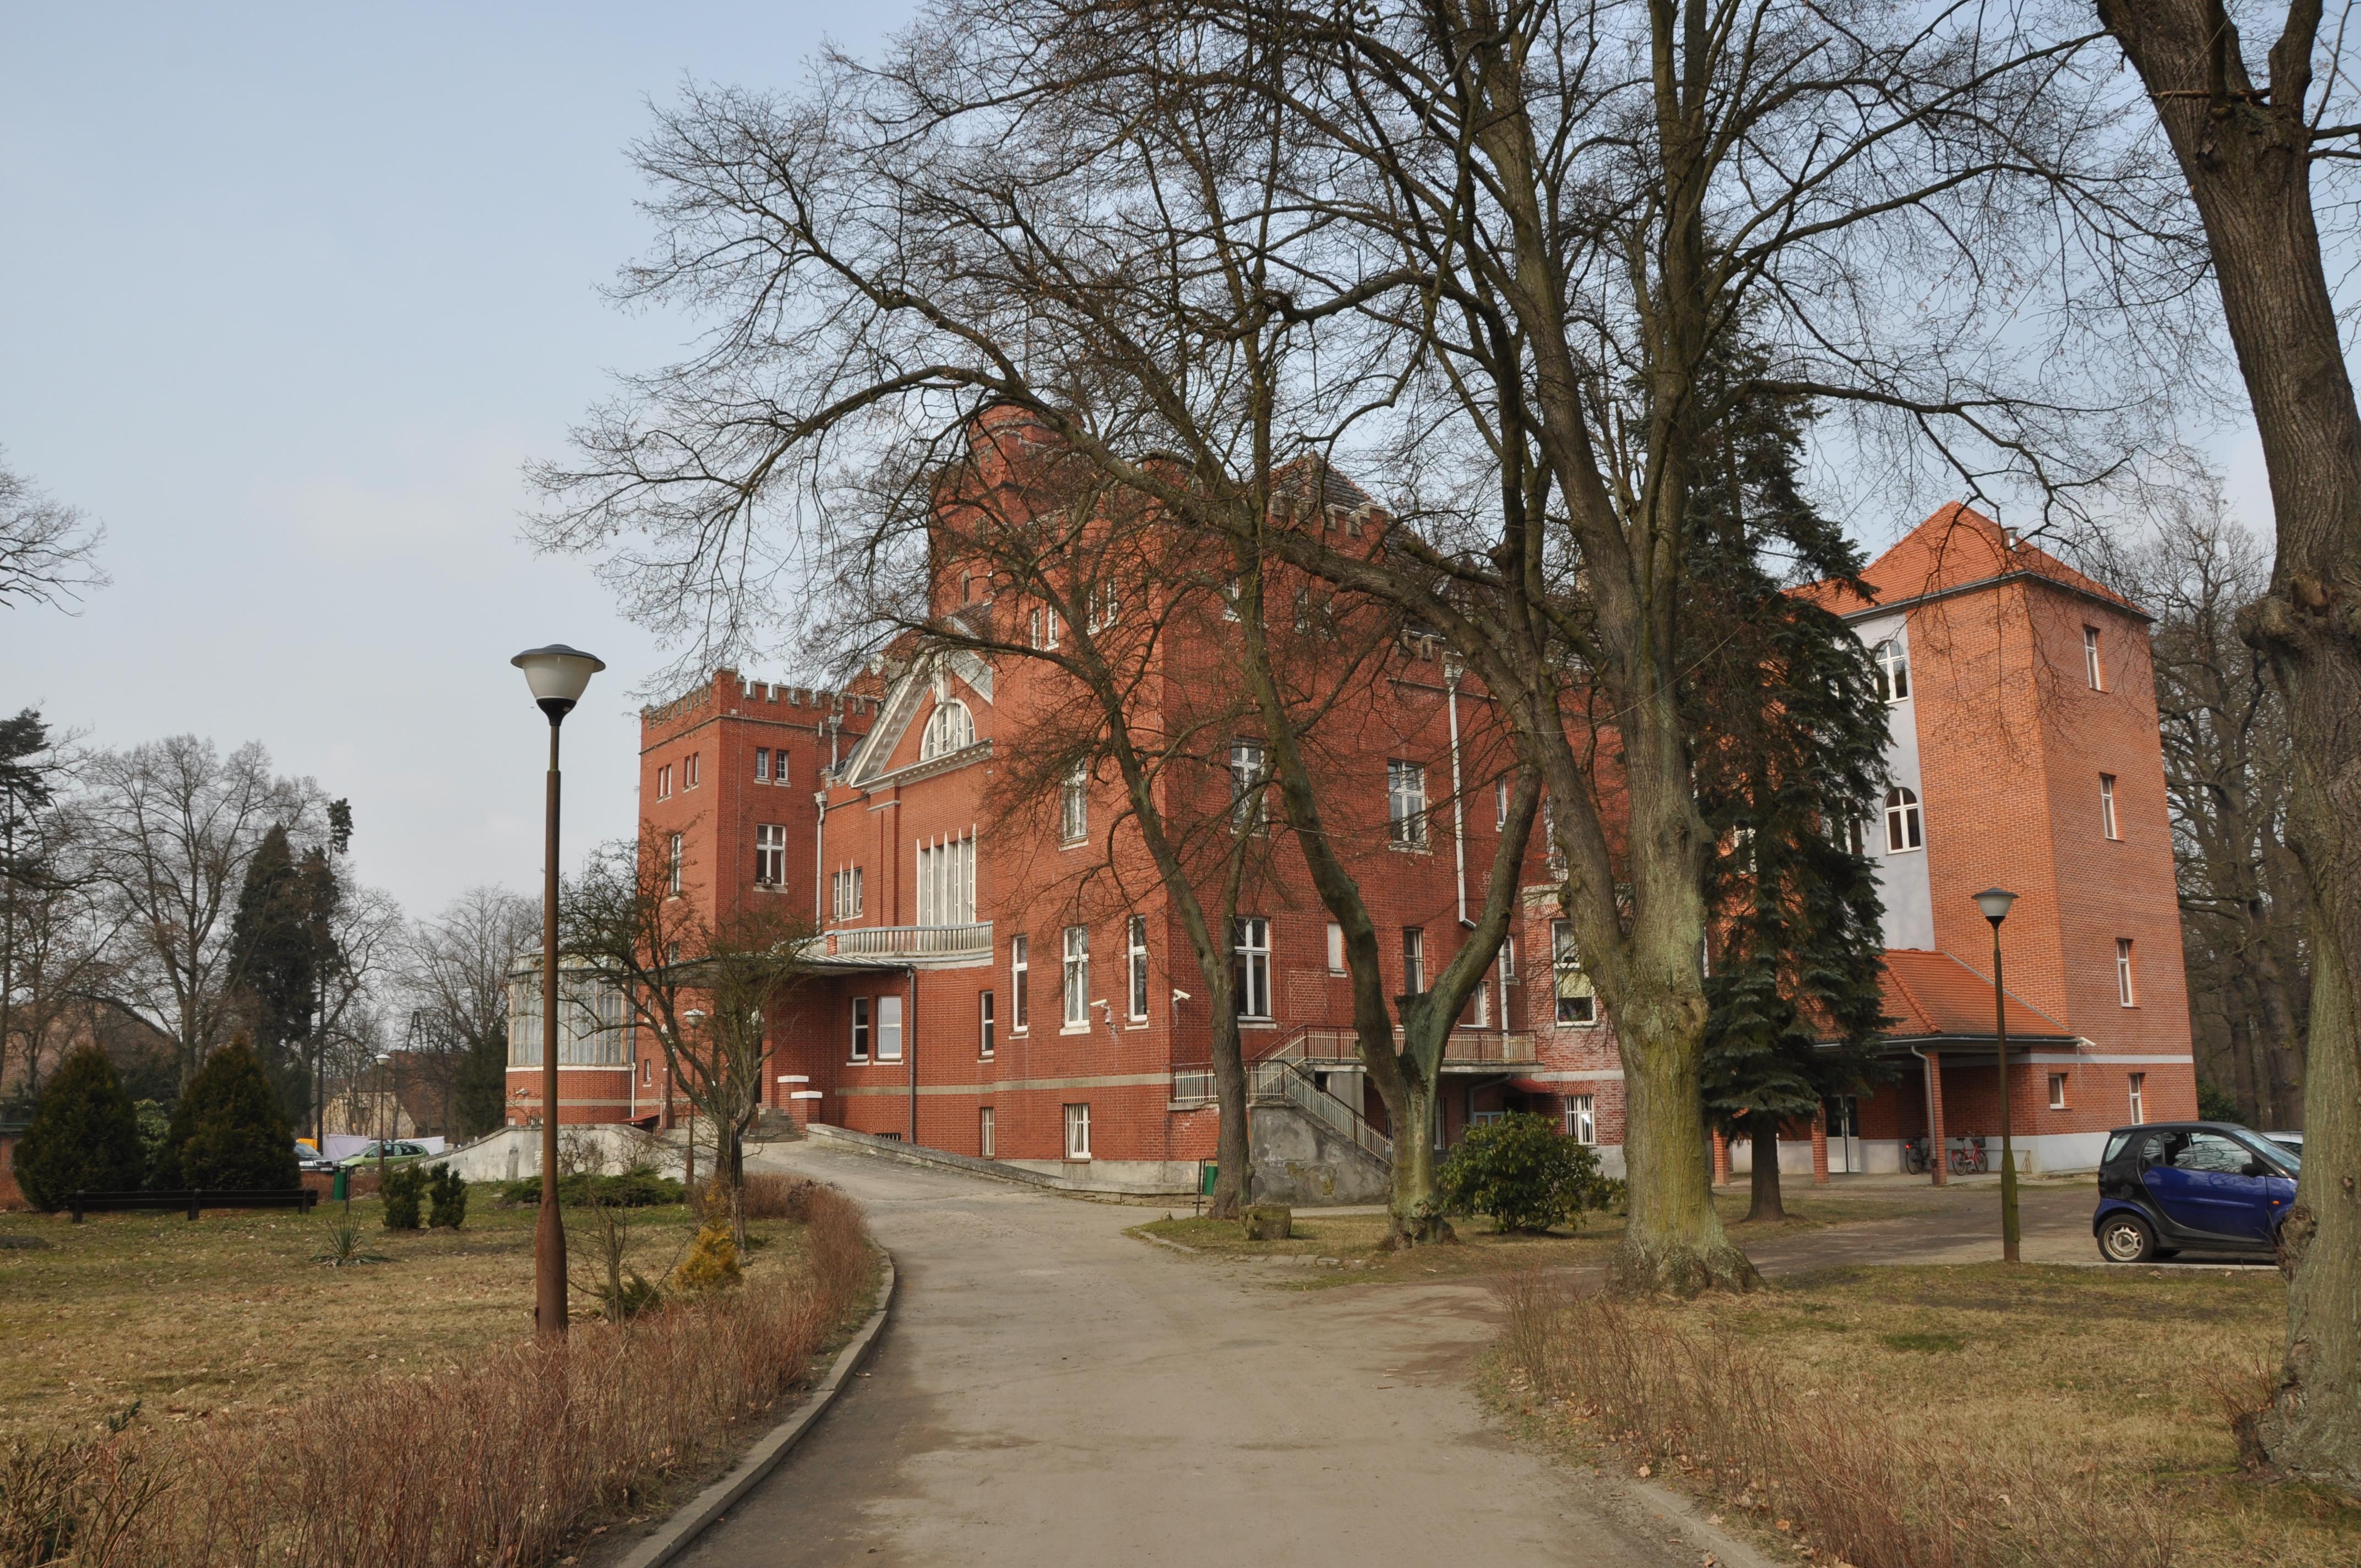 Miłowice (36)